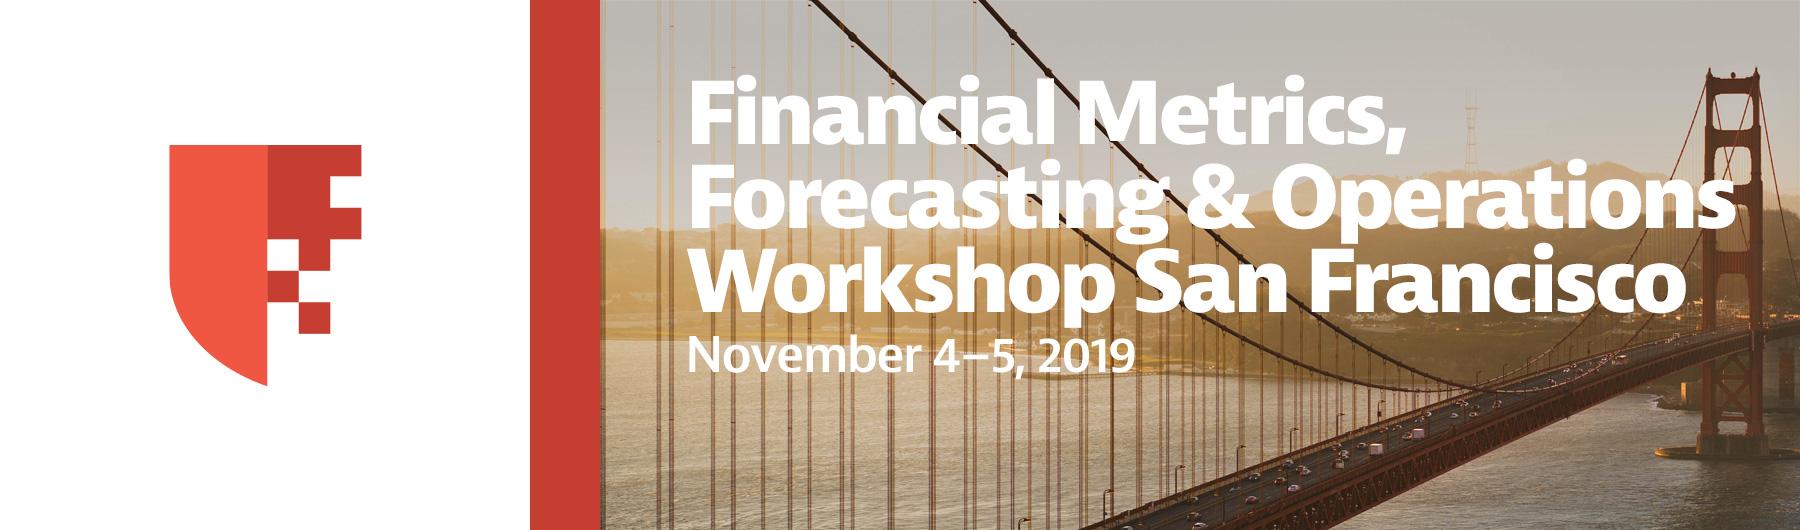 COMPLETE: Financial Metrics, Forecasting & Operations Workshop San Francisco